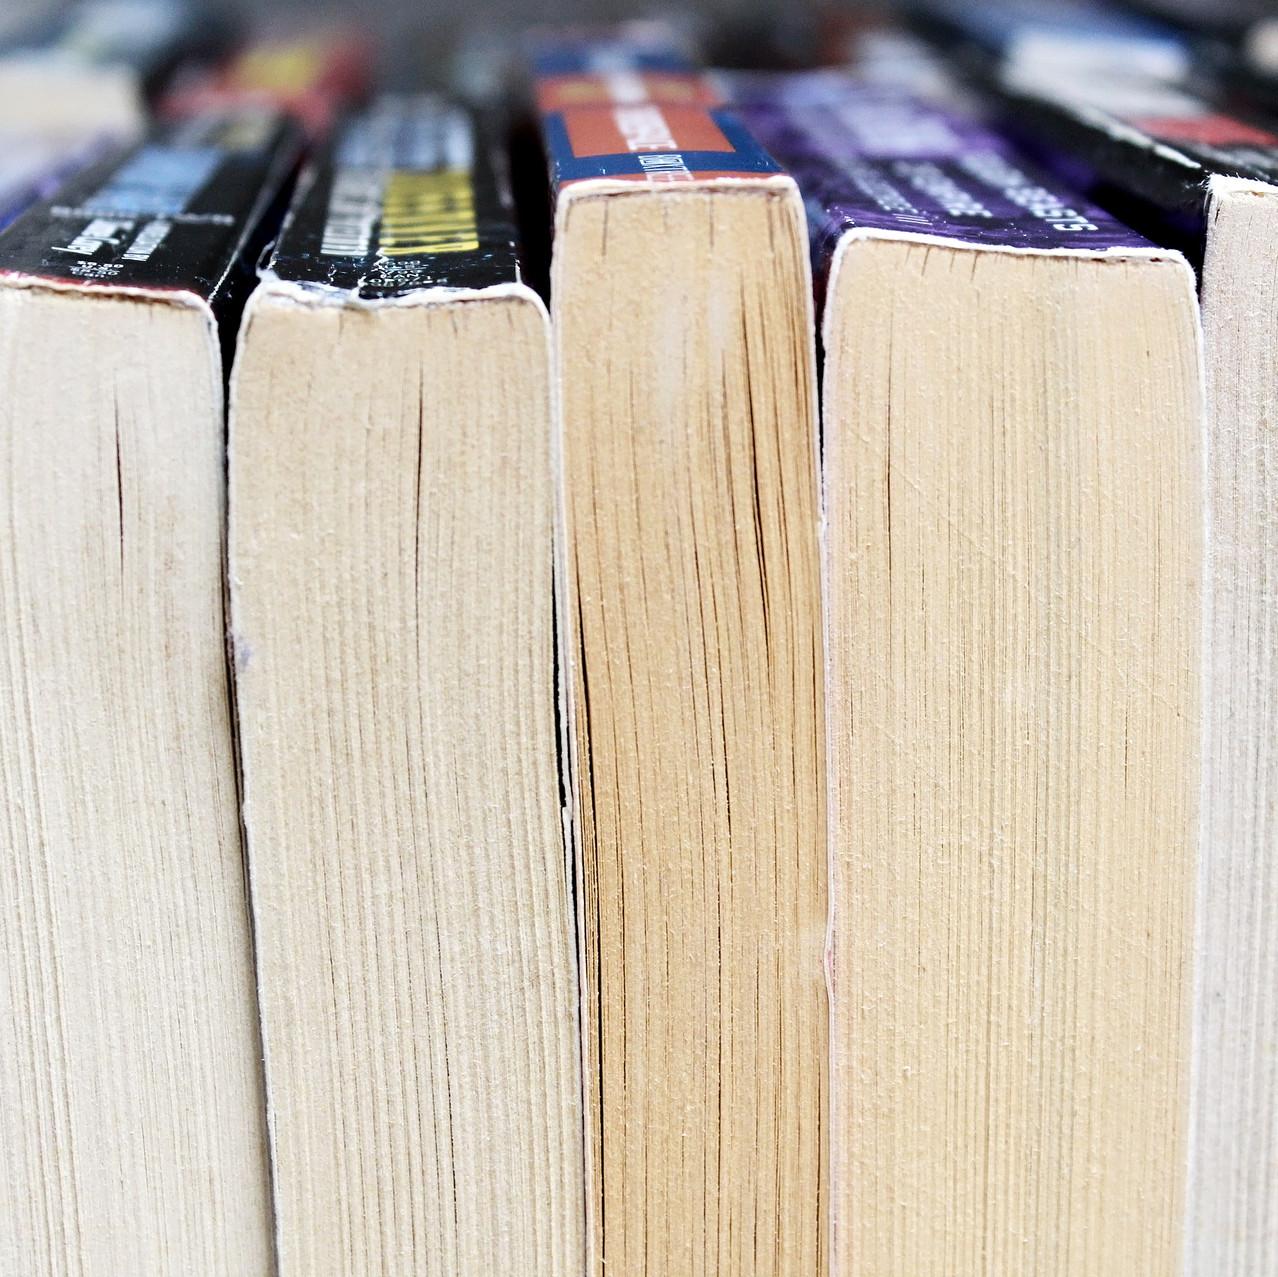 lineup of mass market paperback books